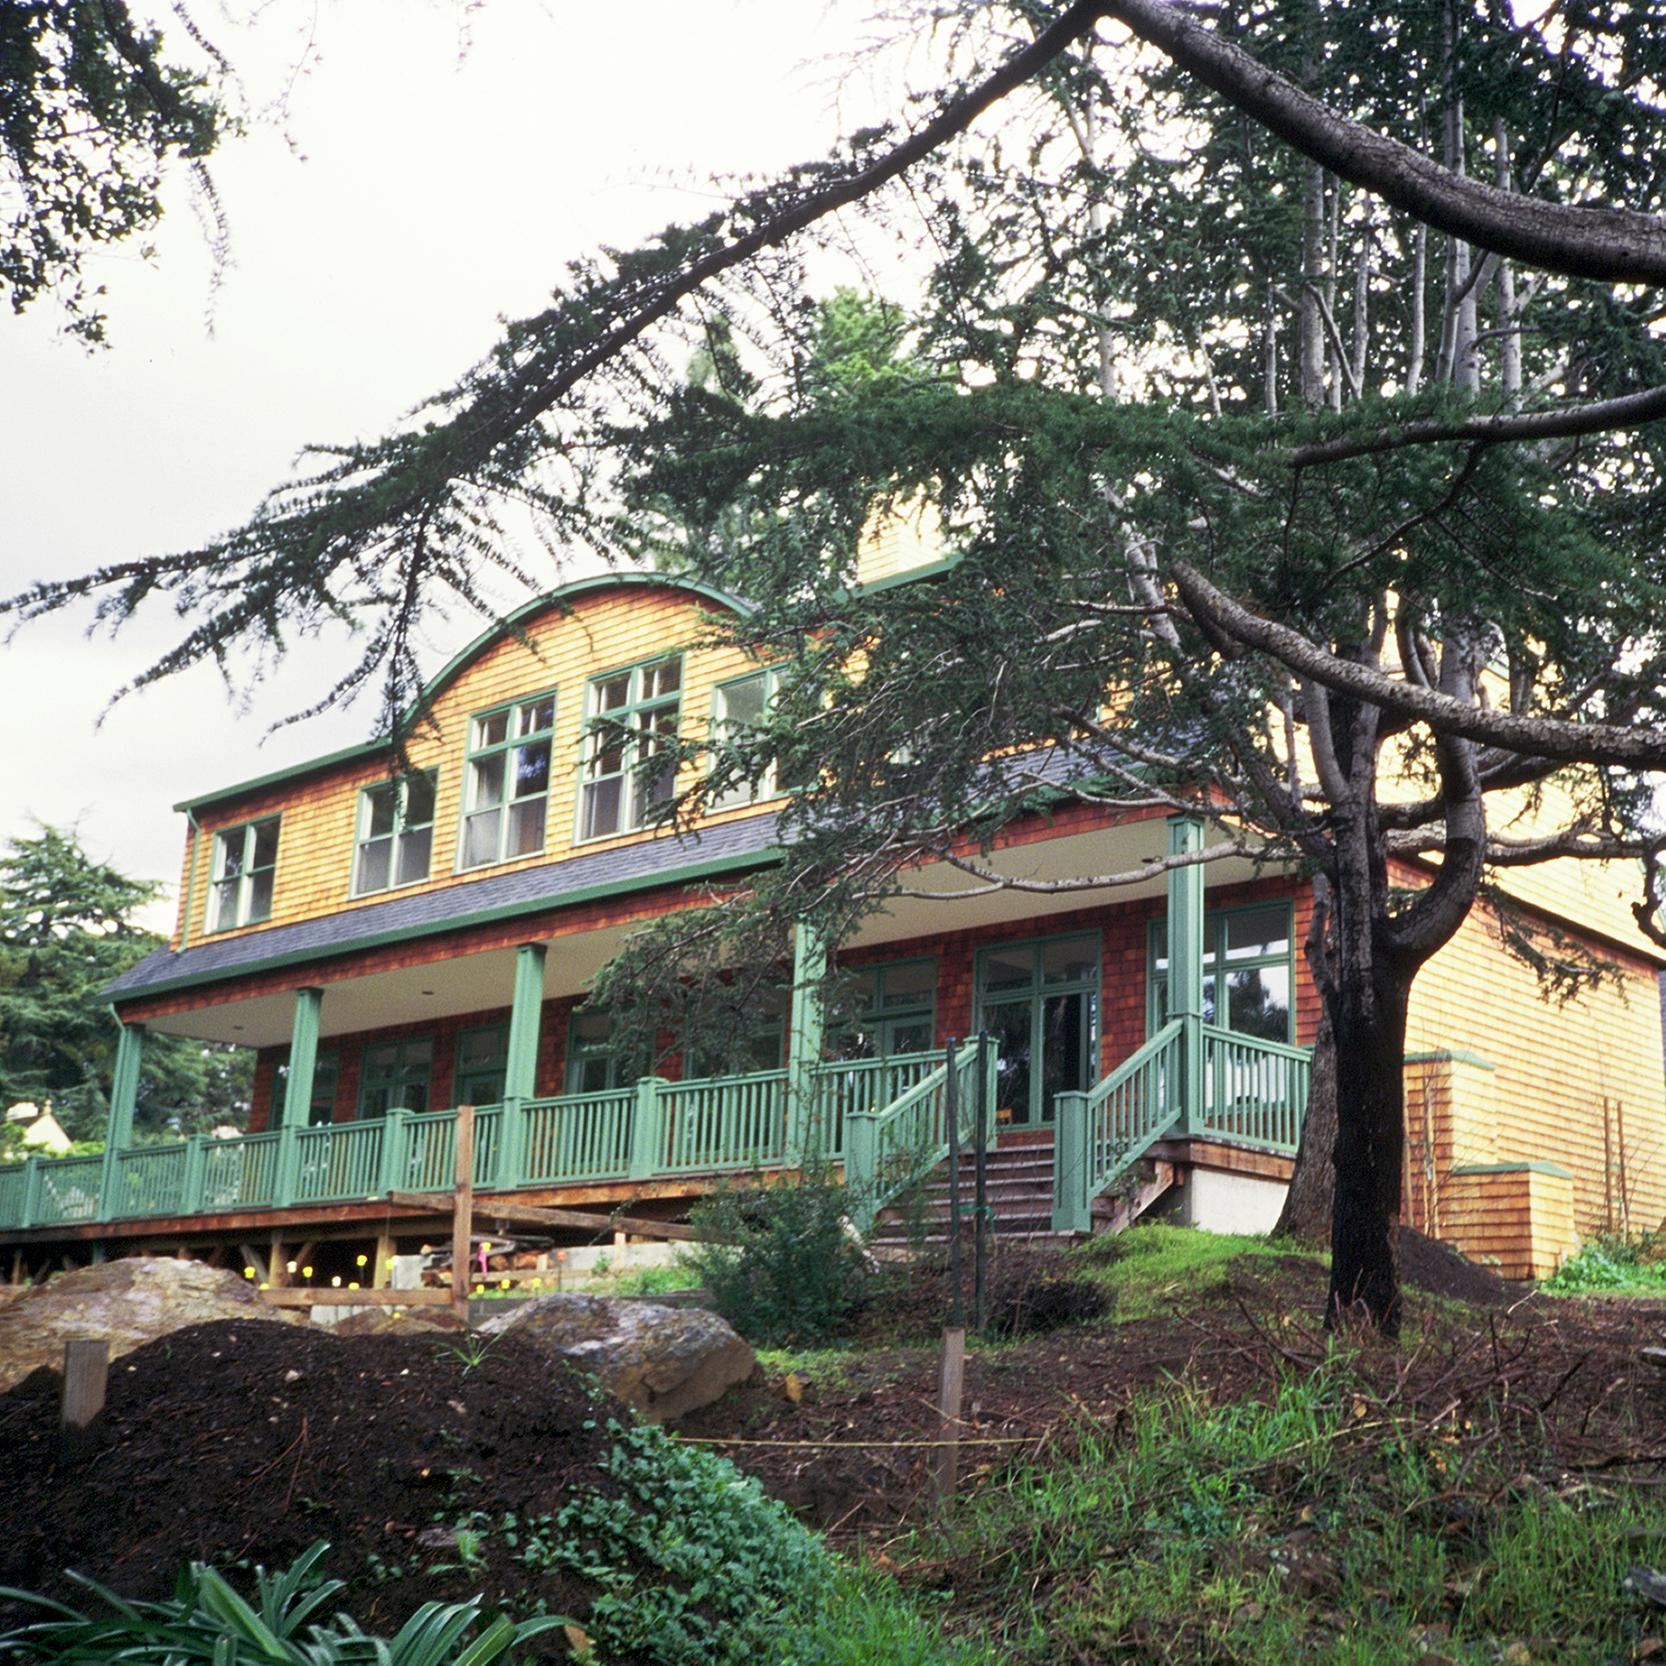 Vastine Residence, Piedmont, CA